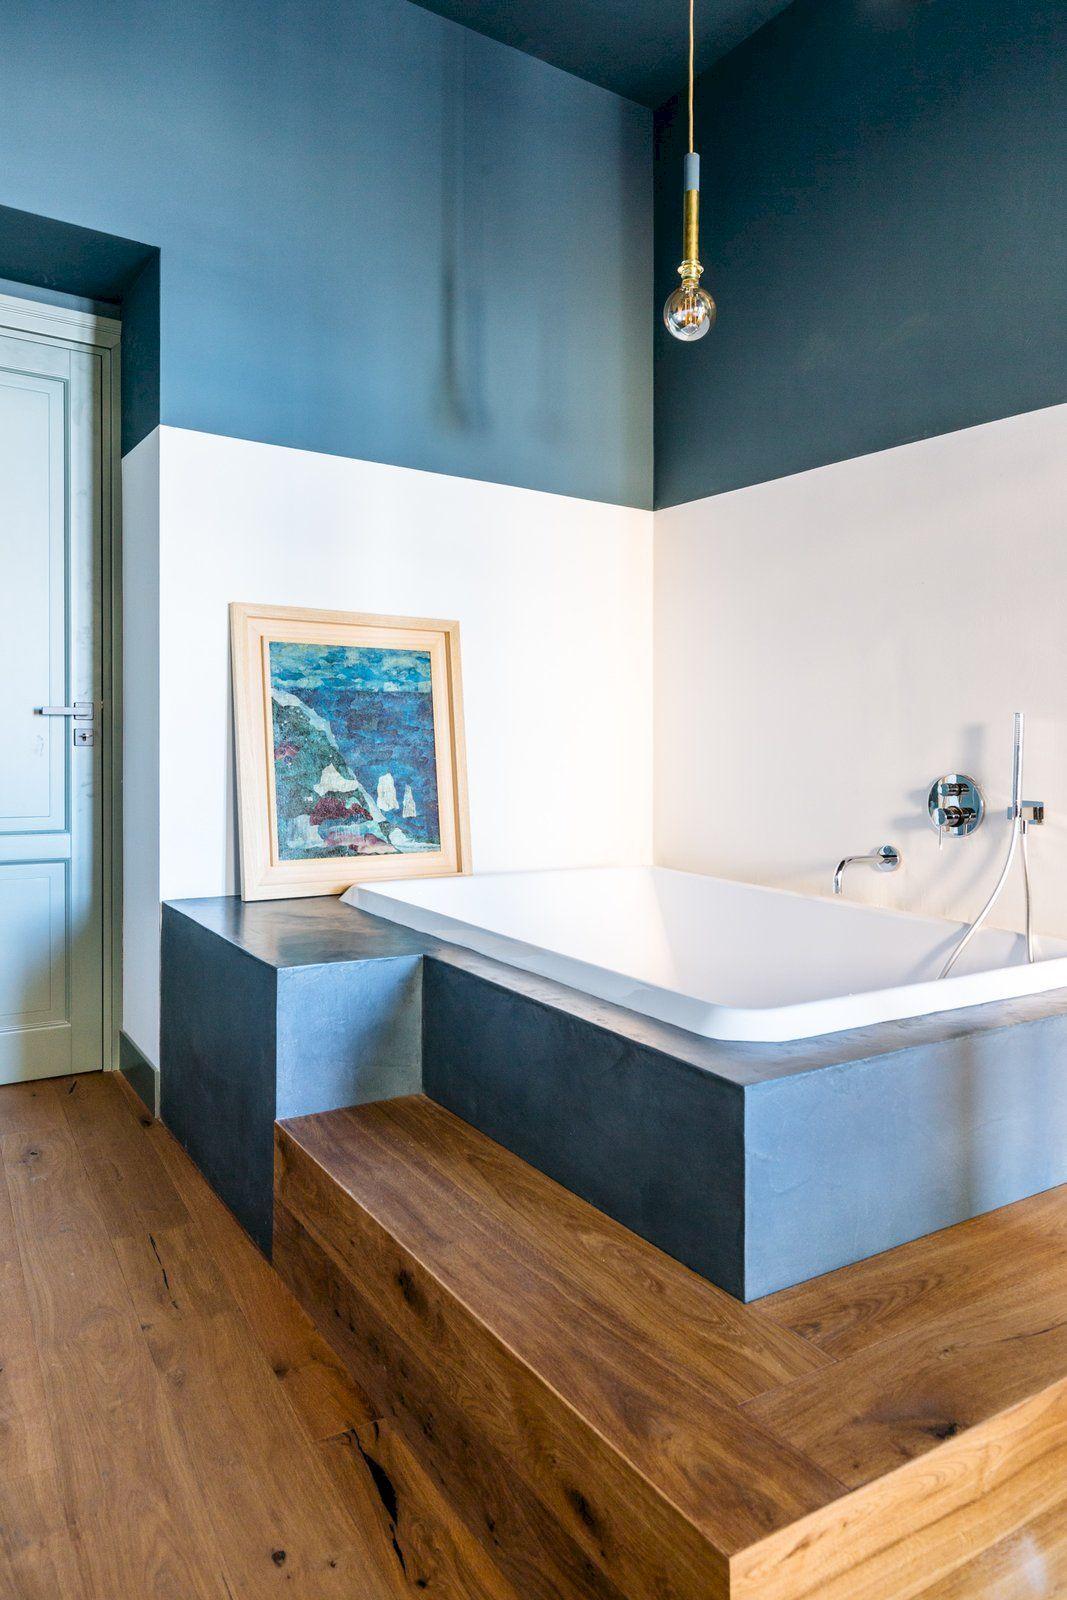 46 Pretty Blue Bathroom Designs Ideas You Can Try | Best ...